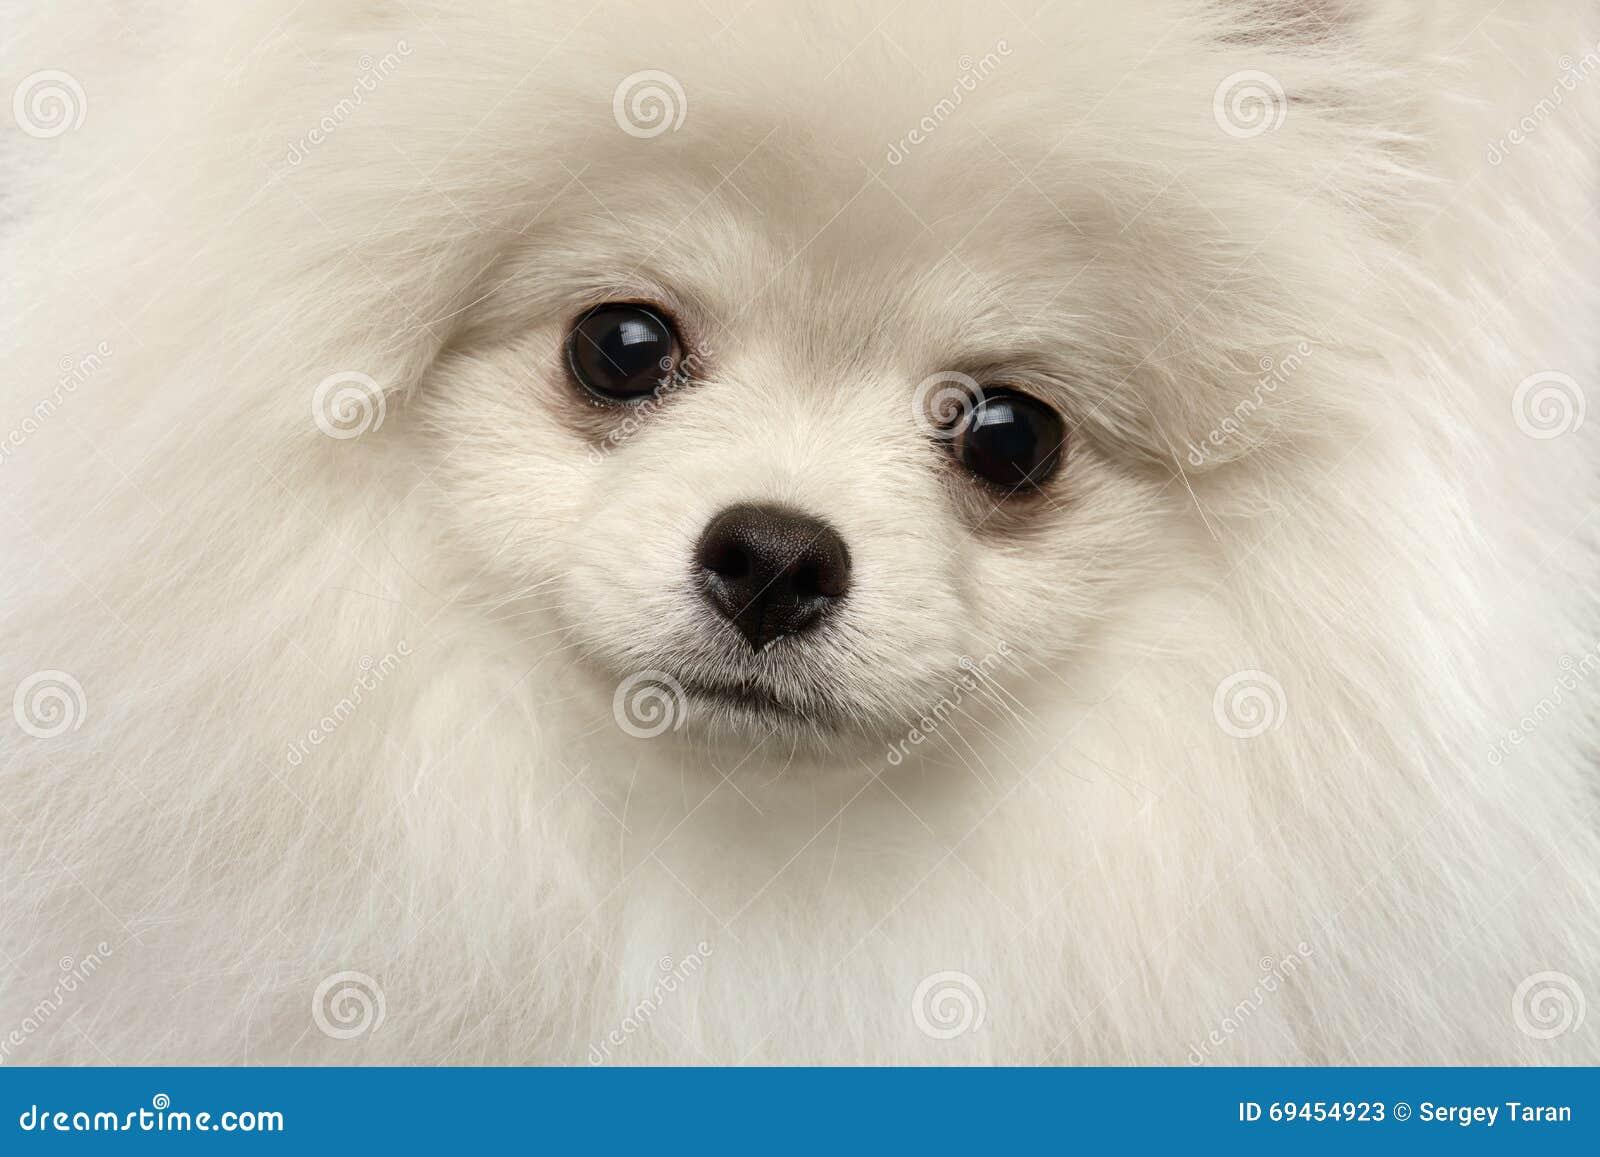 Closeup Furry Cute White Pomeranian Spitz Dog Funny Looking, isolated